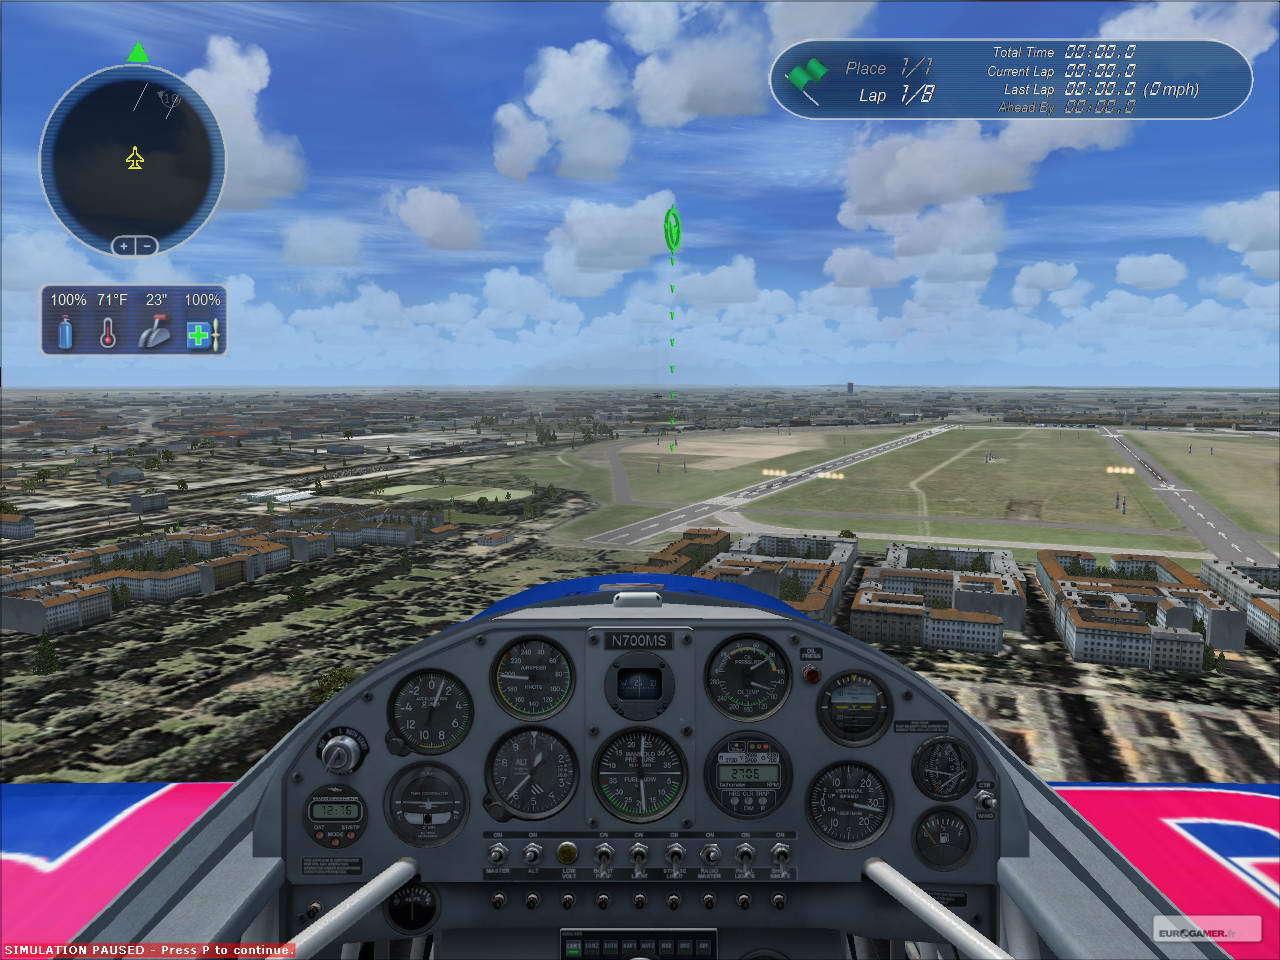 Flight Simulator X Acceleration video game wallpapers Wallpaper 1280x960